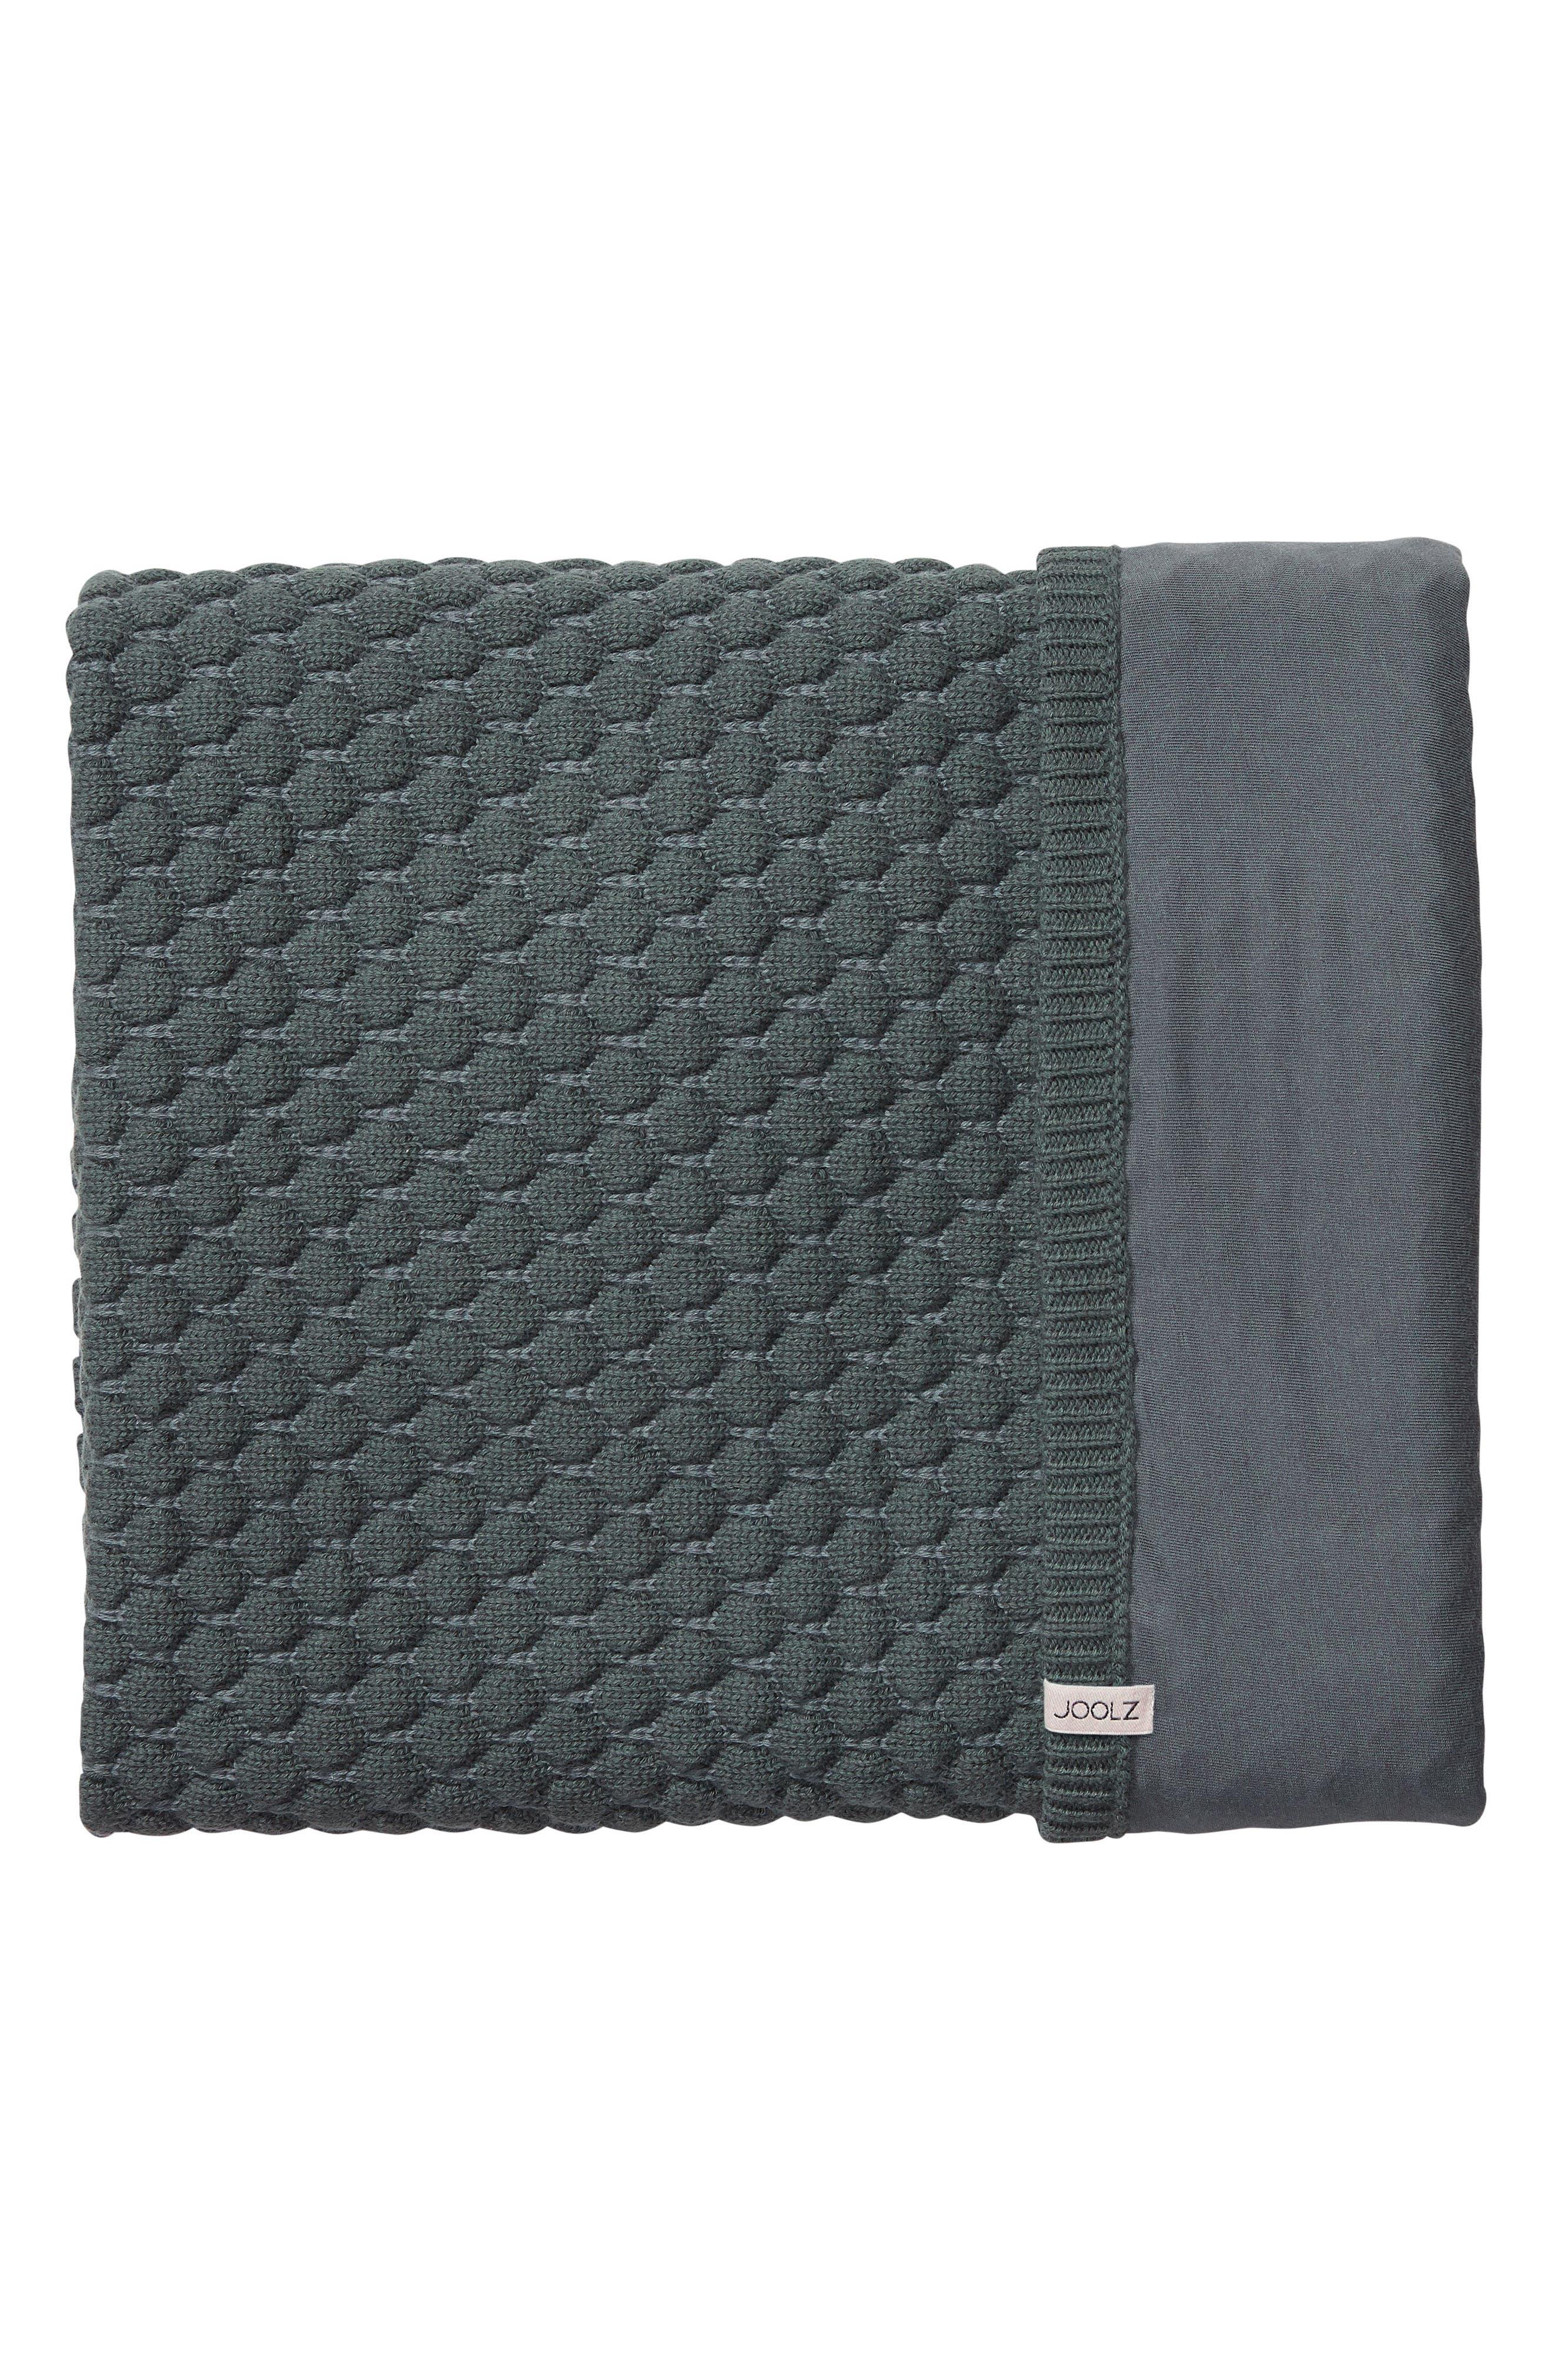 JOOLZ, Essentials Honeycomb Organic Cotton Blanket, Main thumbnail 1, color, GREY